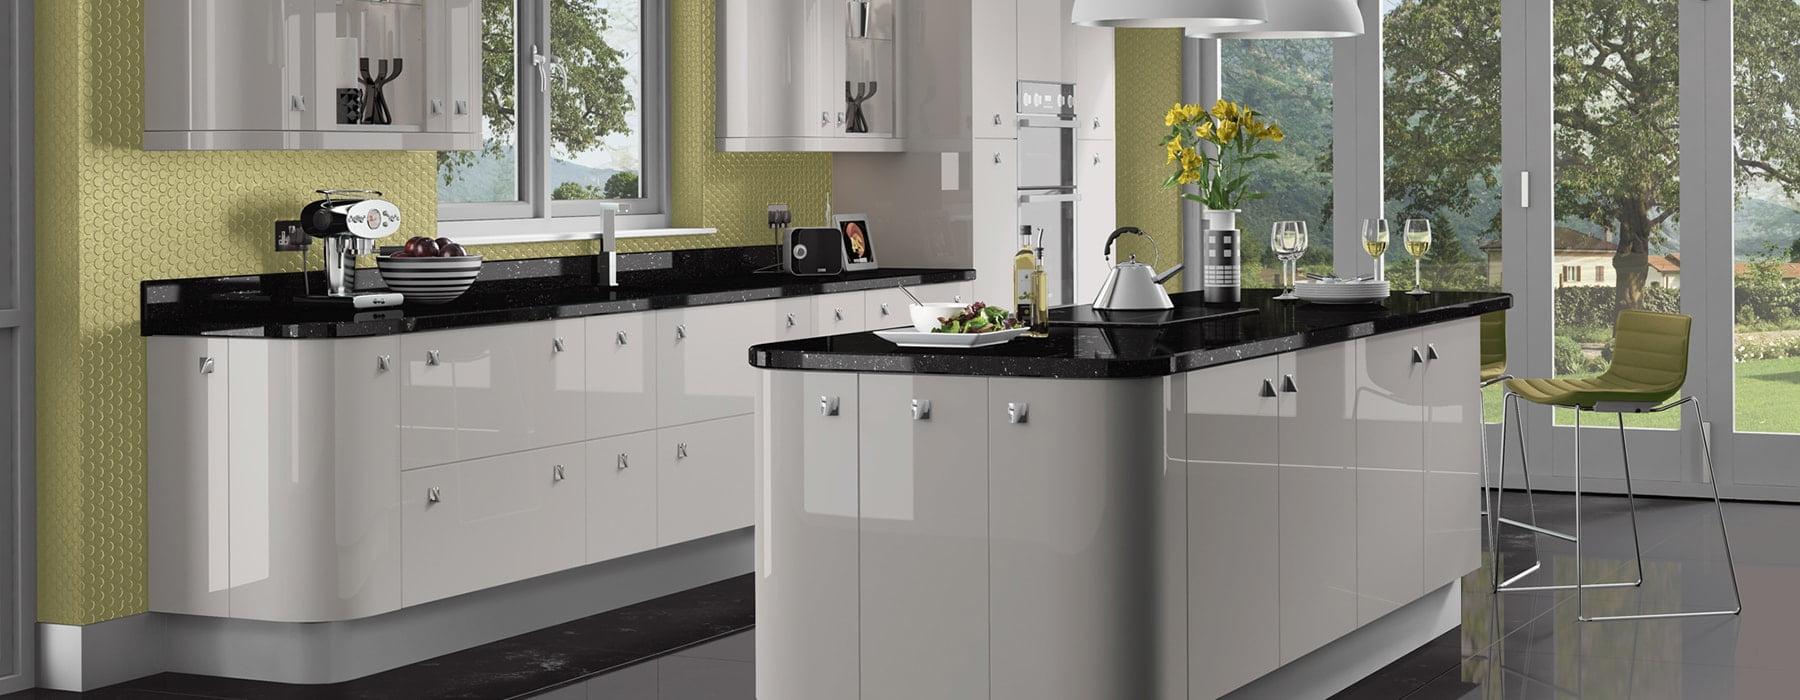 image kashmir kitchen